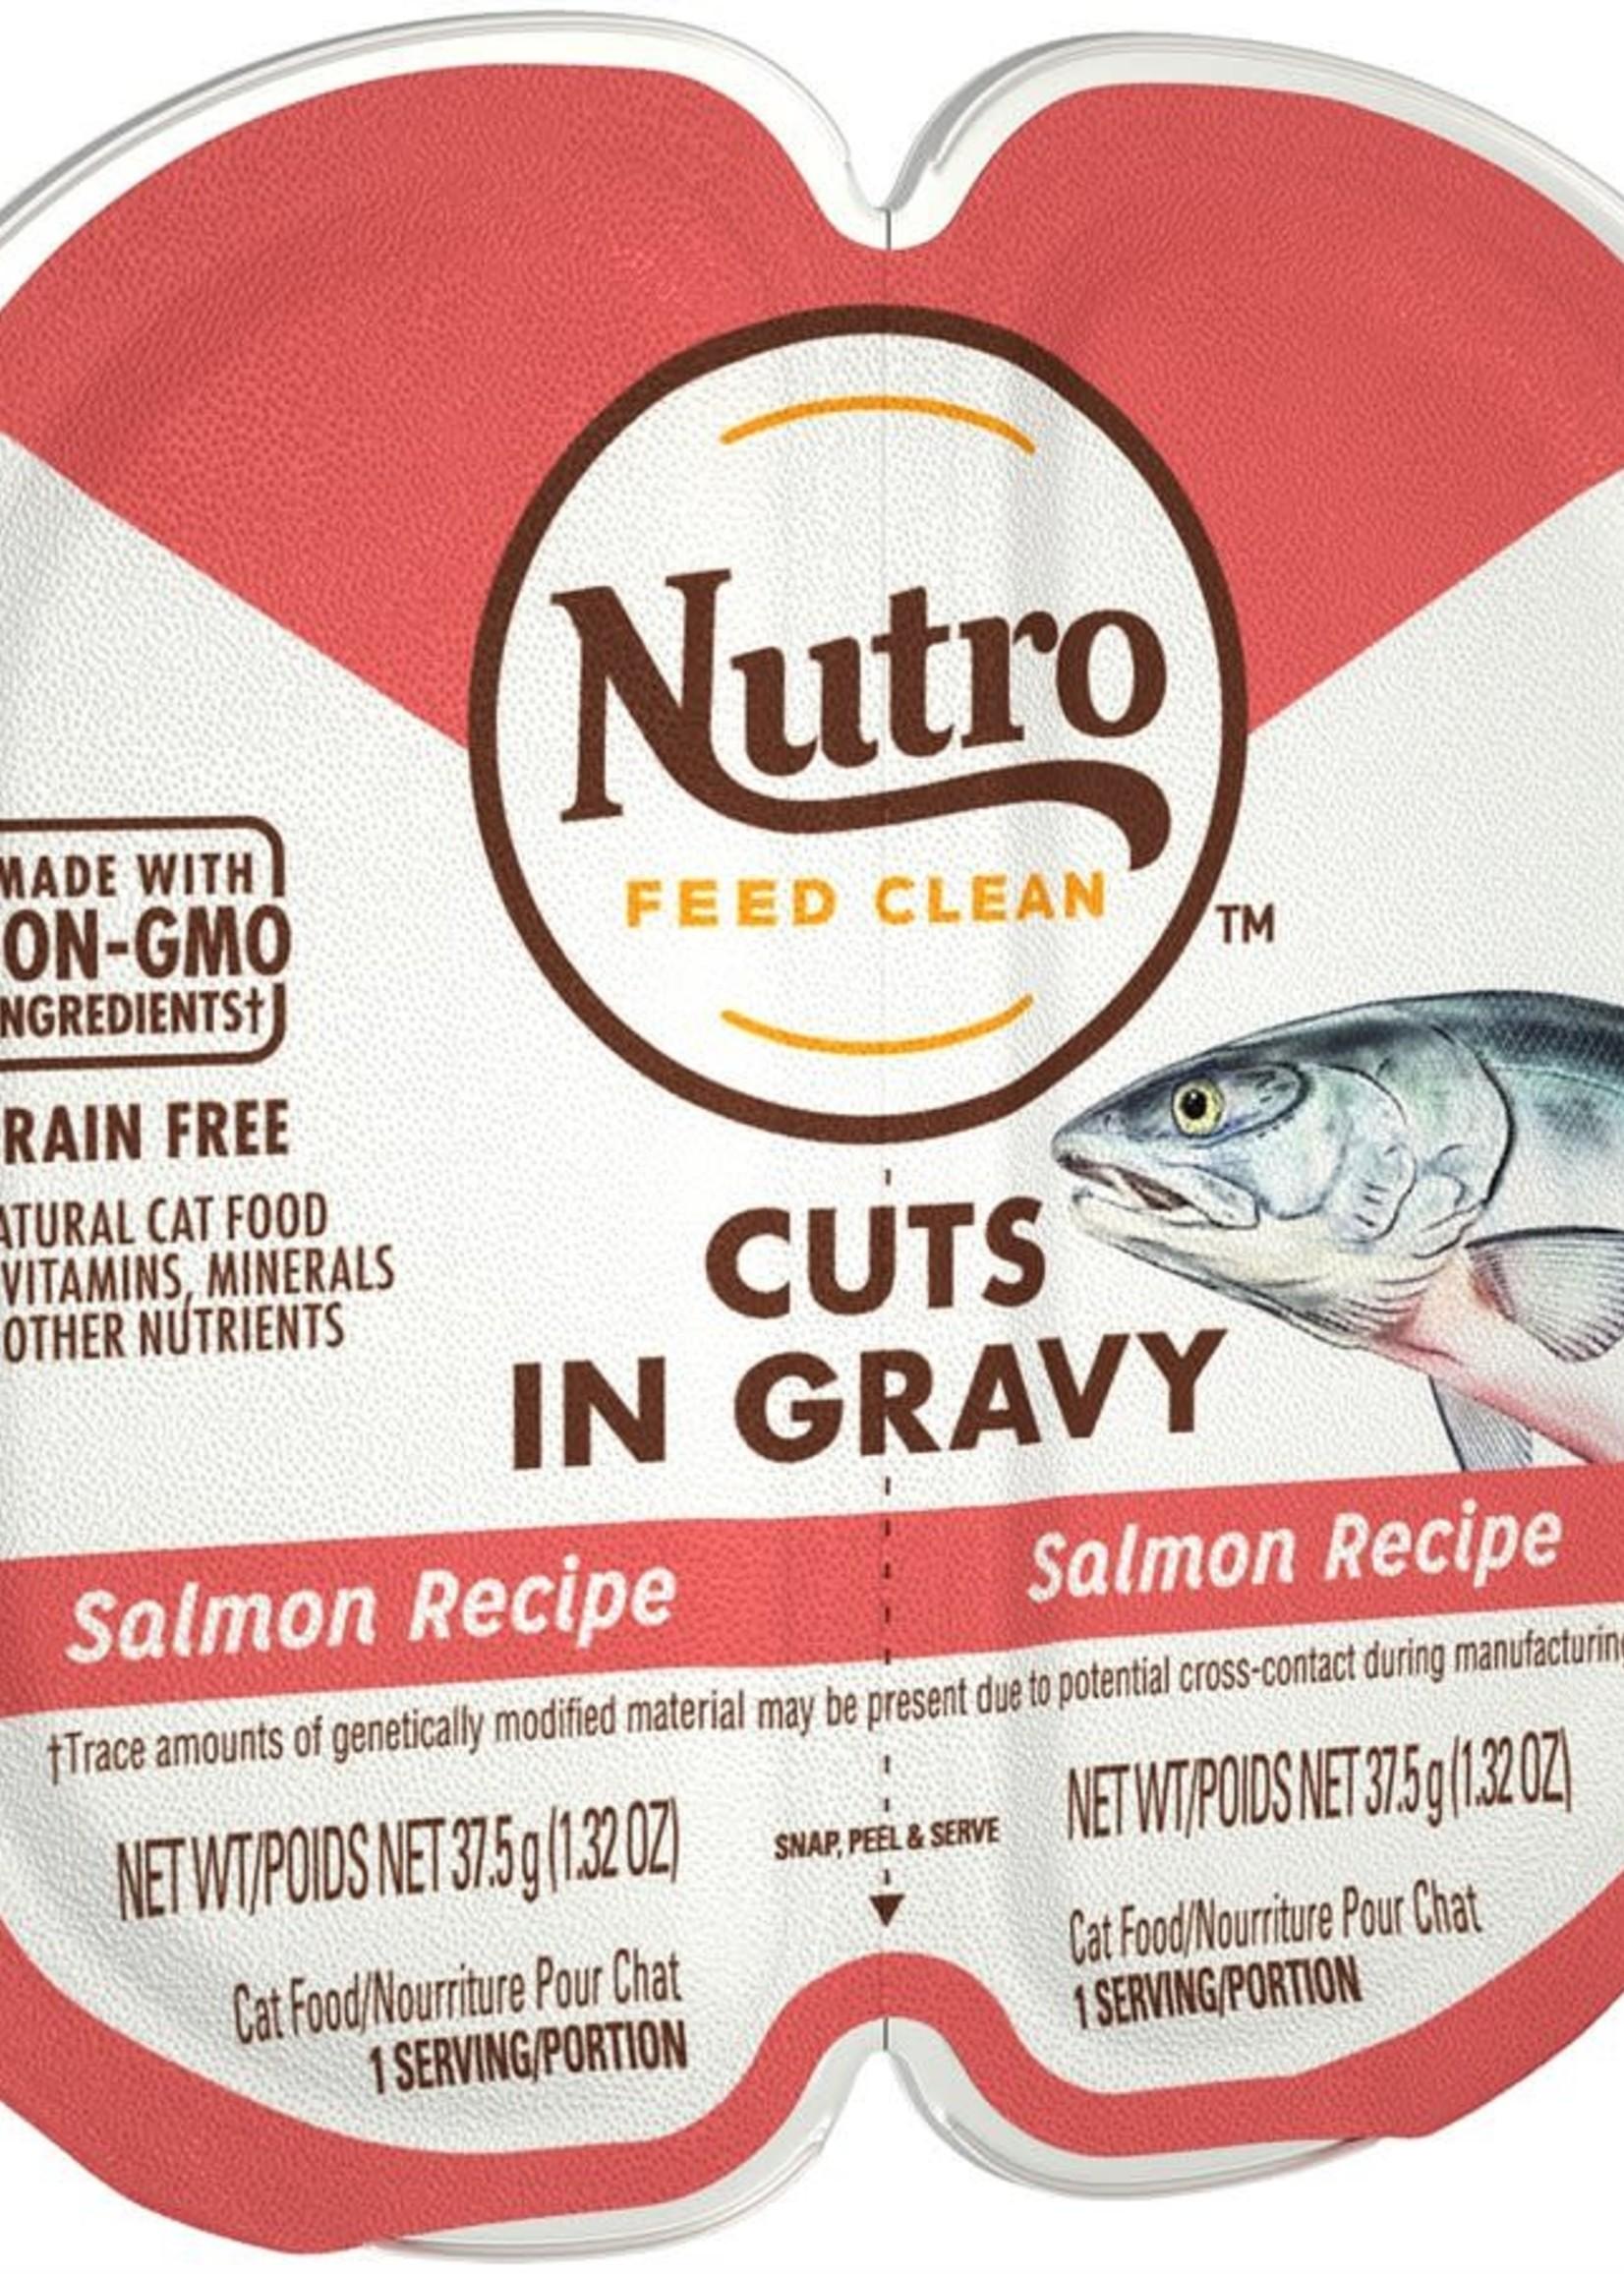 Nutro™ NUTRO PERFECT PORTIONS GRAIN FREE SALMON  1.32oz